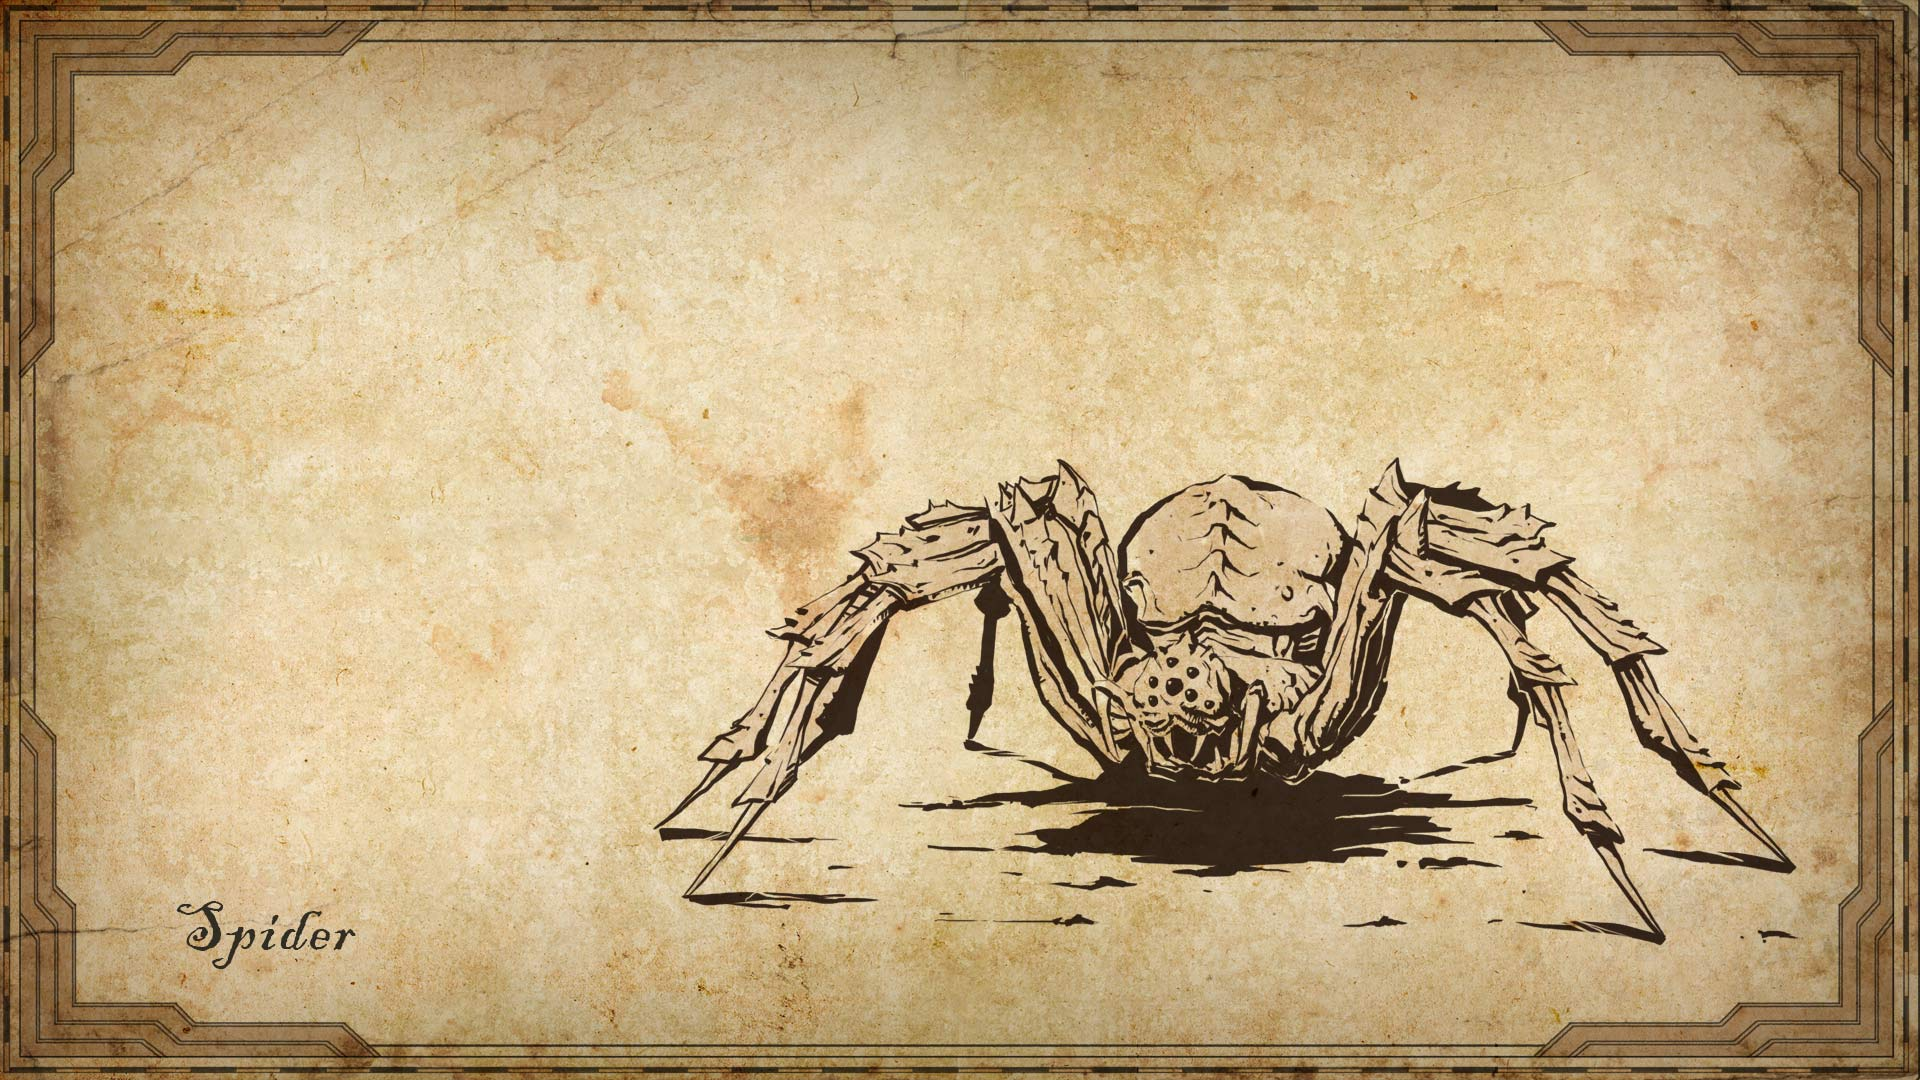 Steam card exchange showcase legend of grimrock 2 card 4 of 8artwork spider publicscrutiny Images